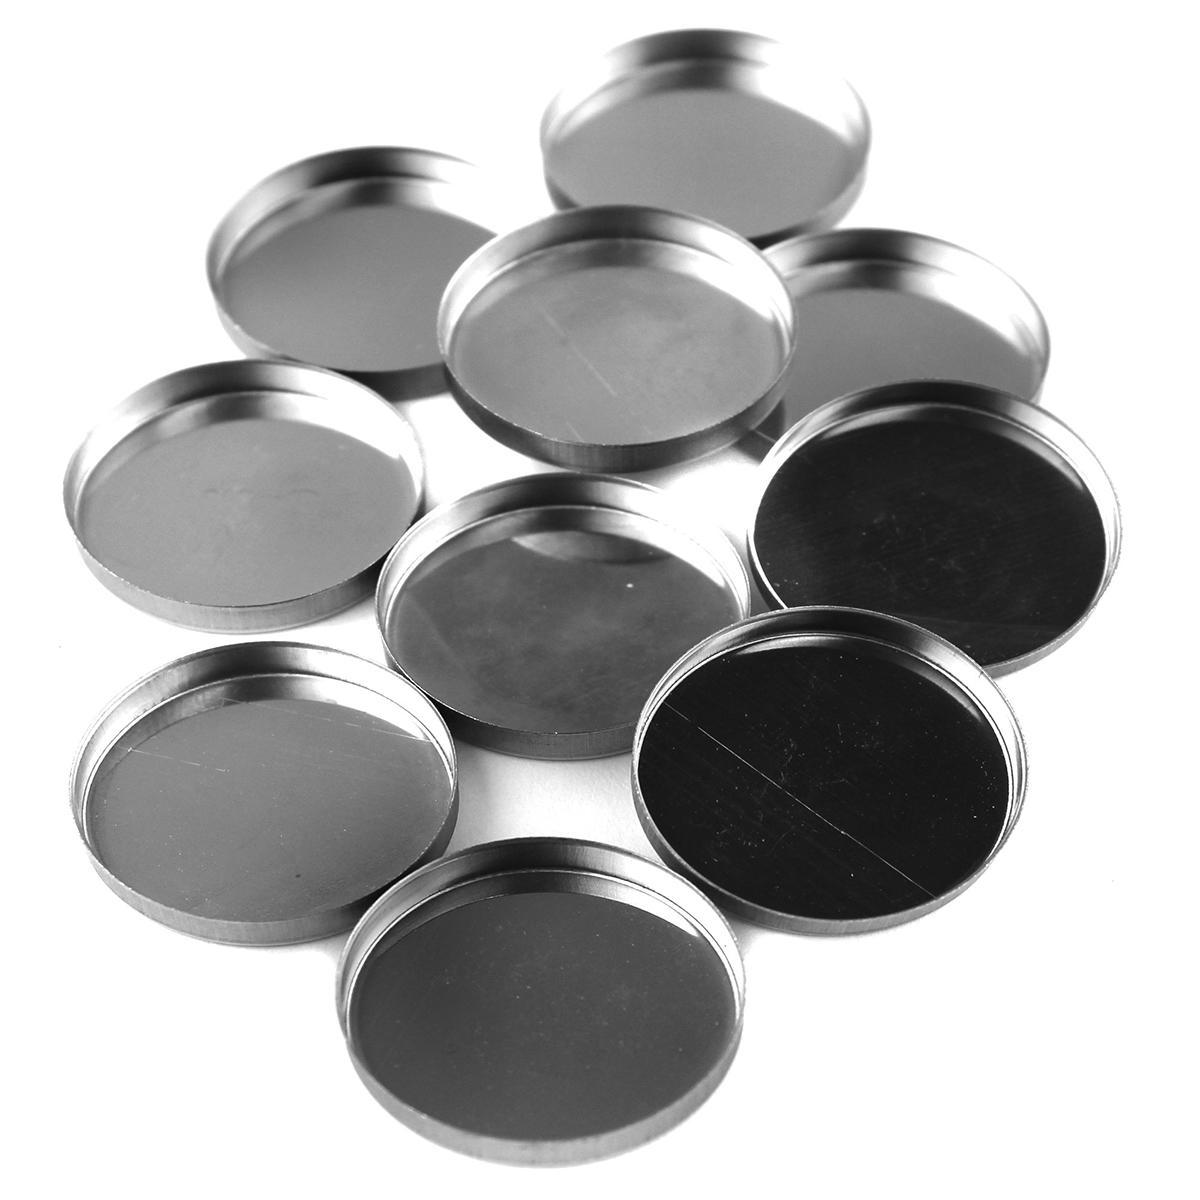 Z Palette Round Empty Metal Pans 10 pack